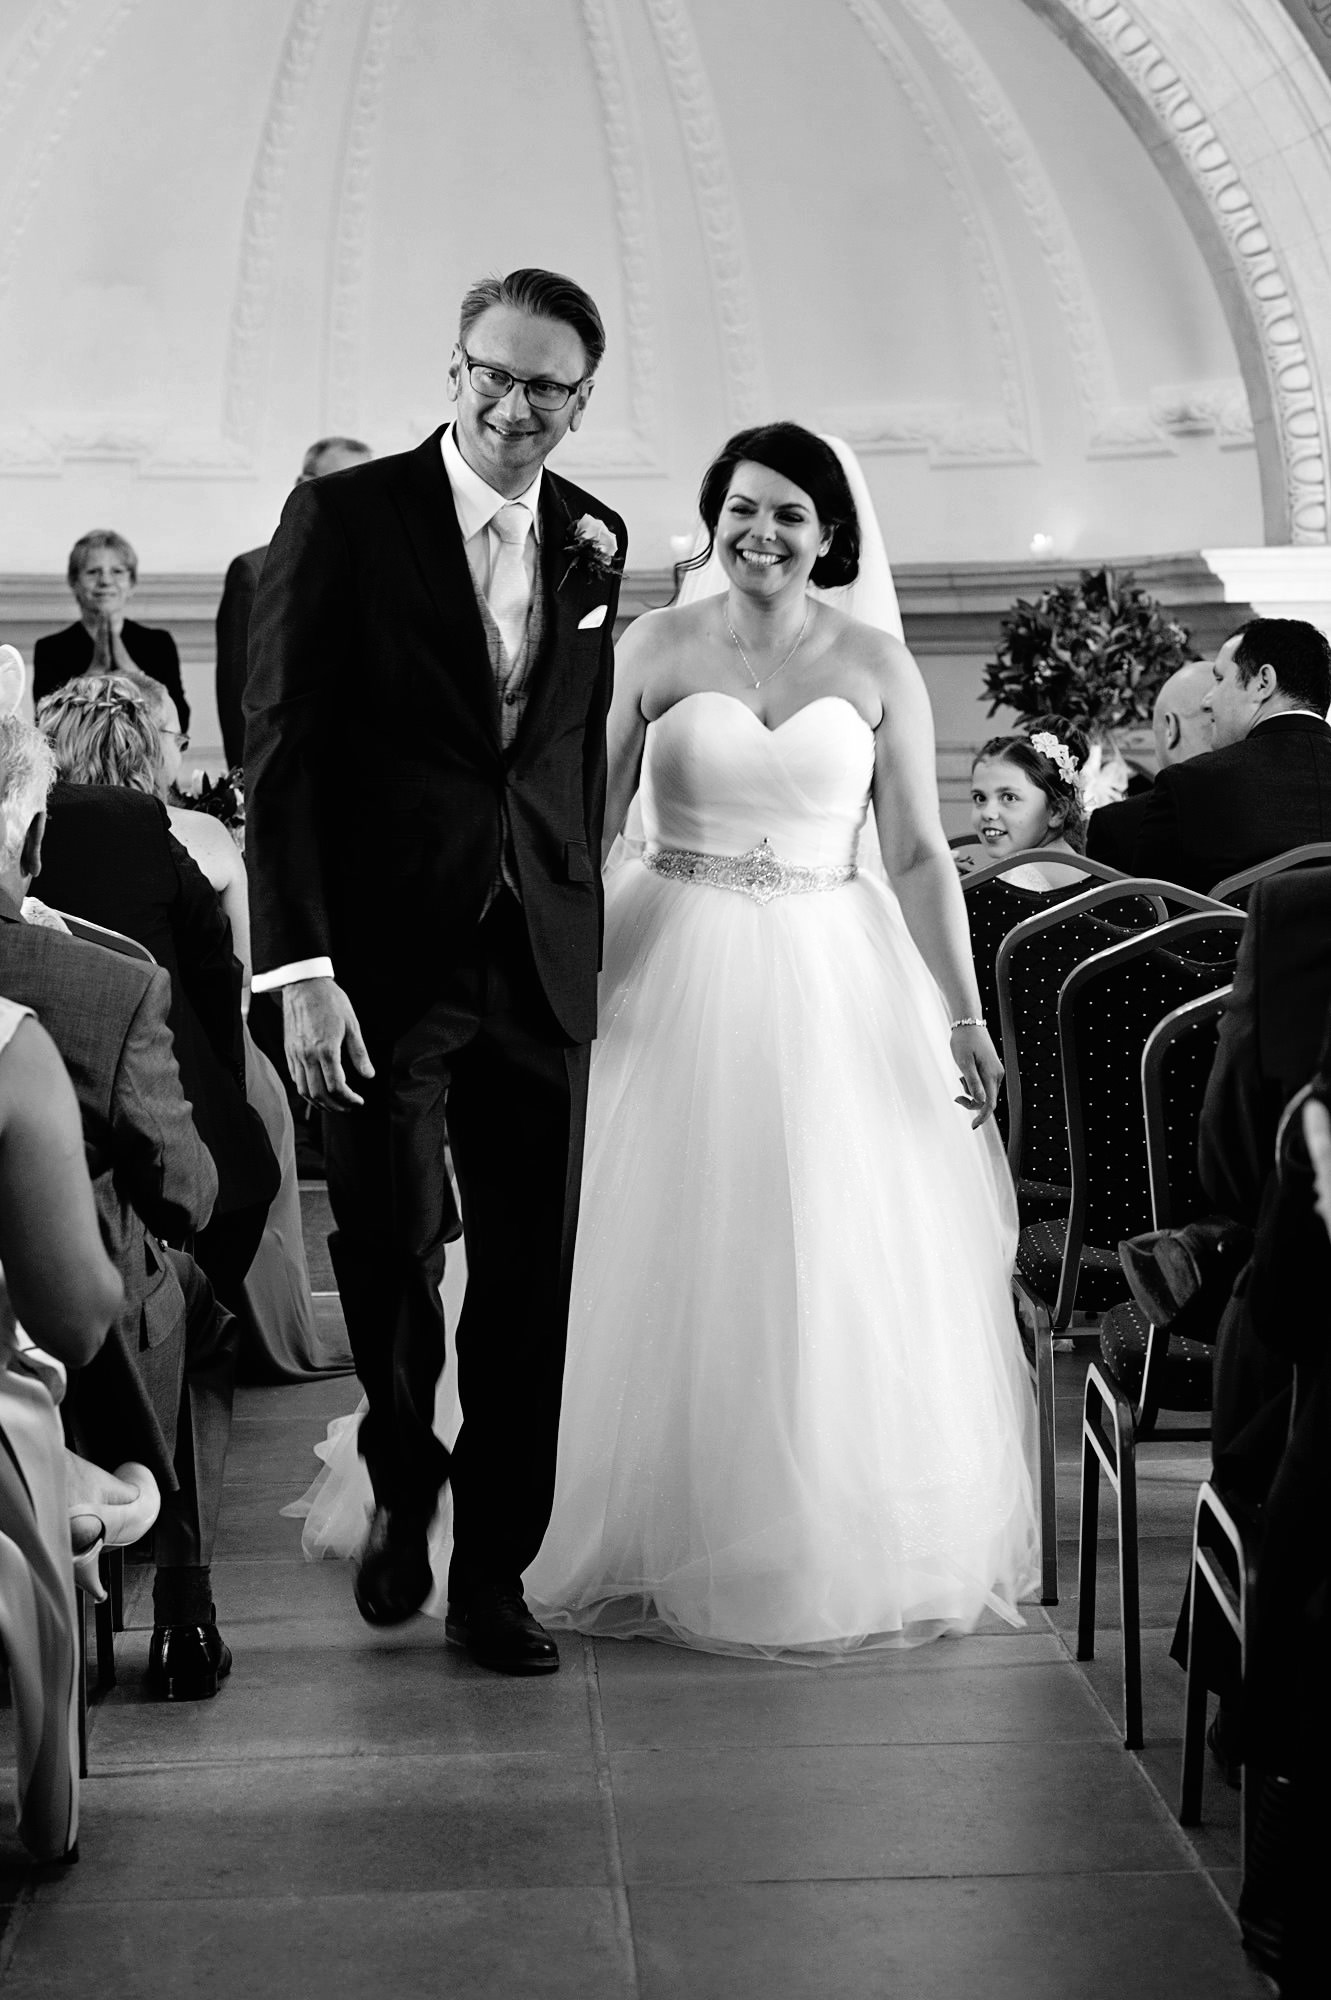 wedding at Normanton Park hotel (9).jpg